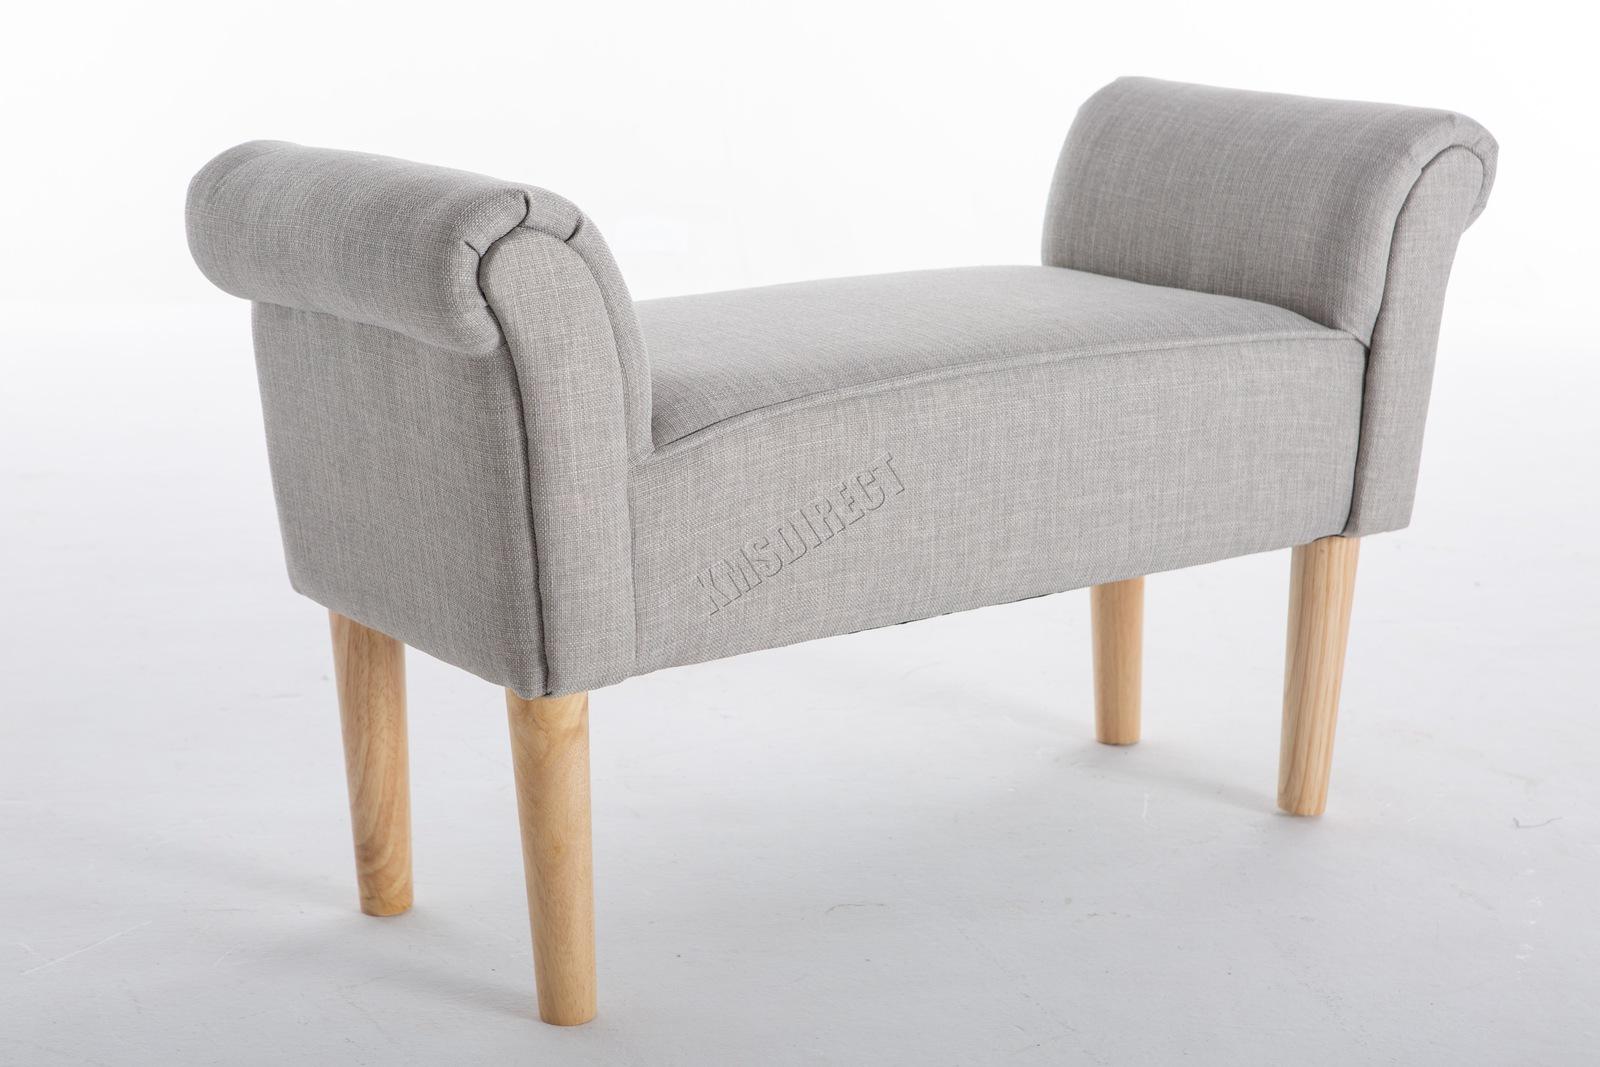 Westwood fabric bench footstool seat pouf pouffee ottoman stool bedroom lounge ebay - Poggiapiedi letto ...